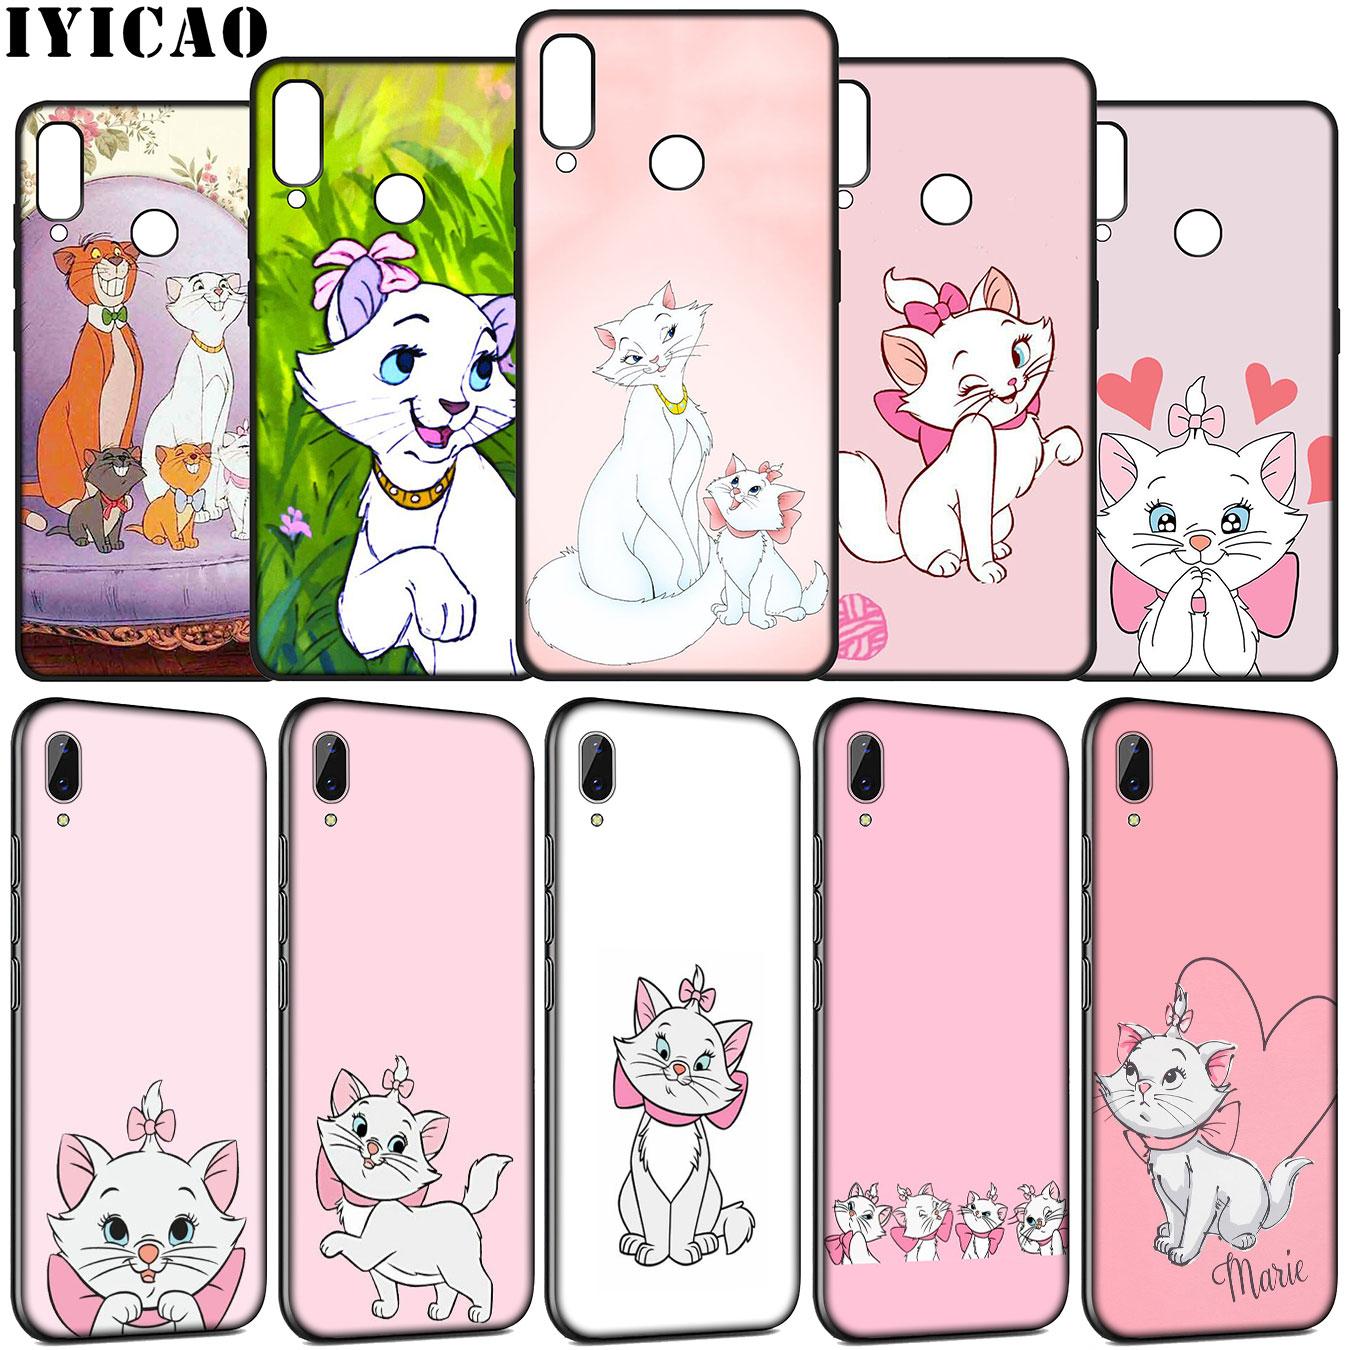 IYICAO The AristoCats Marie Gatos cat Soft Case para Huawei Y9 Y7 Y6 Prime 2019 Honra ver 20 8C 8X8 9 9X10 Lite 7C 7X 7A Pro